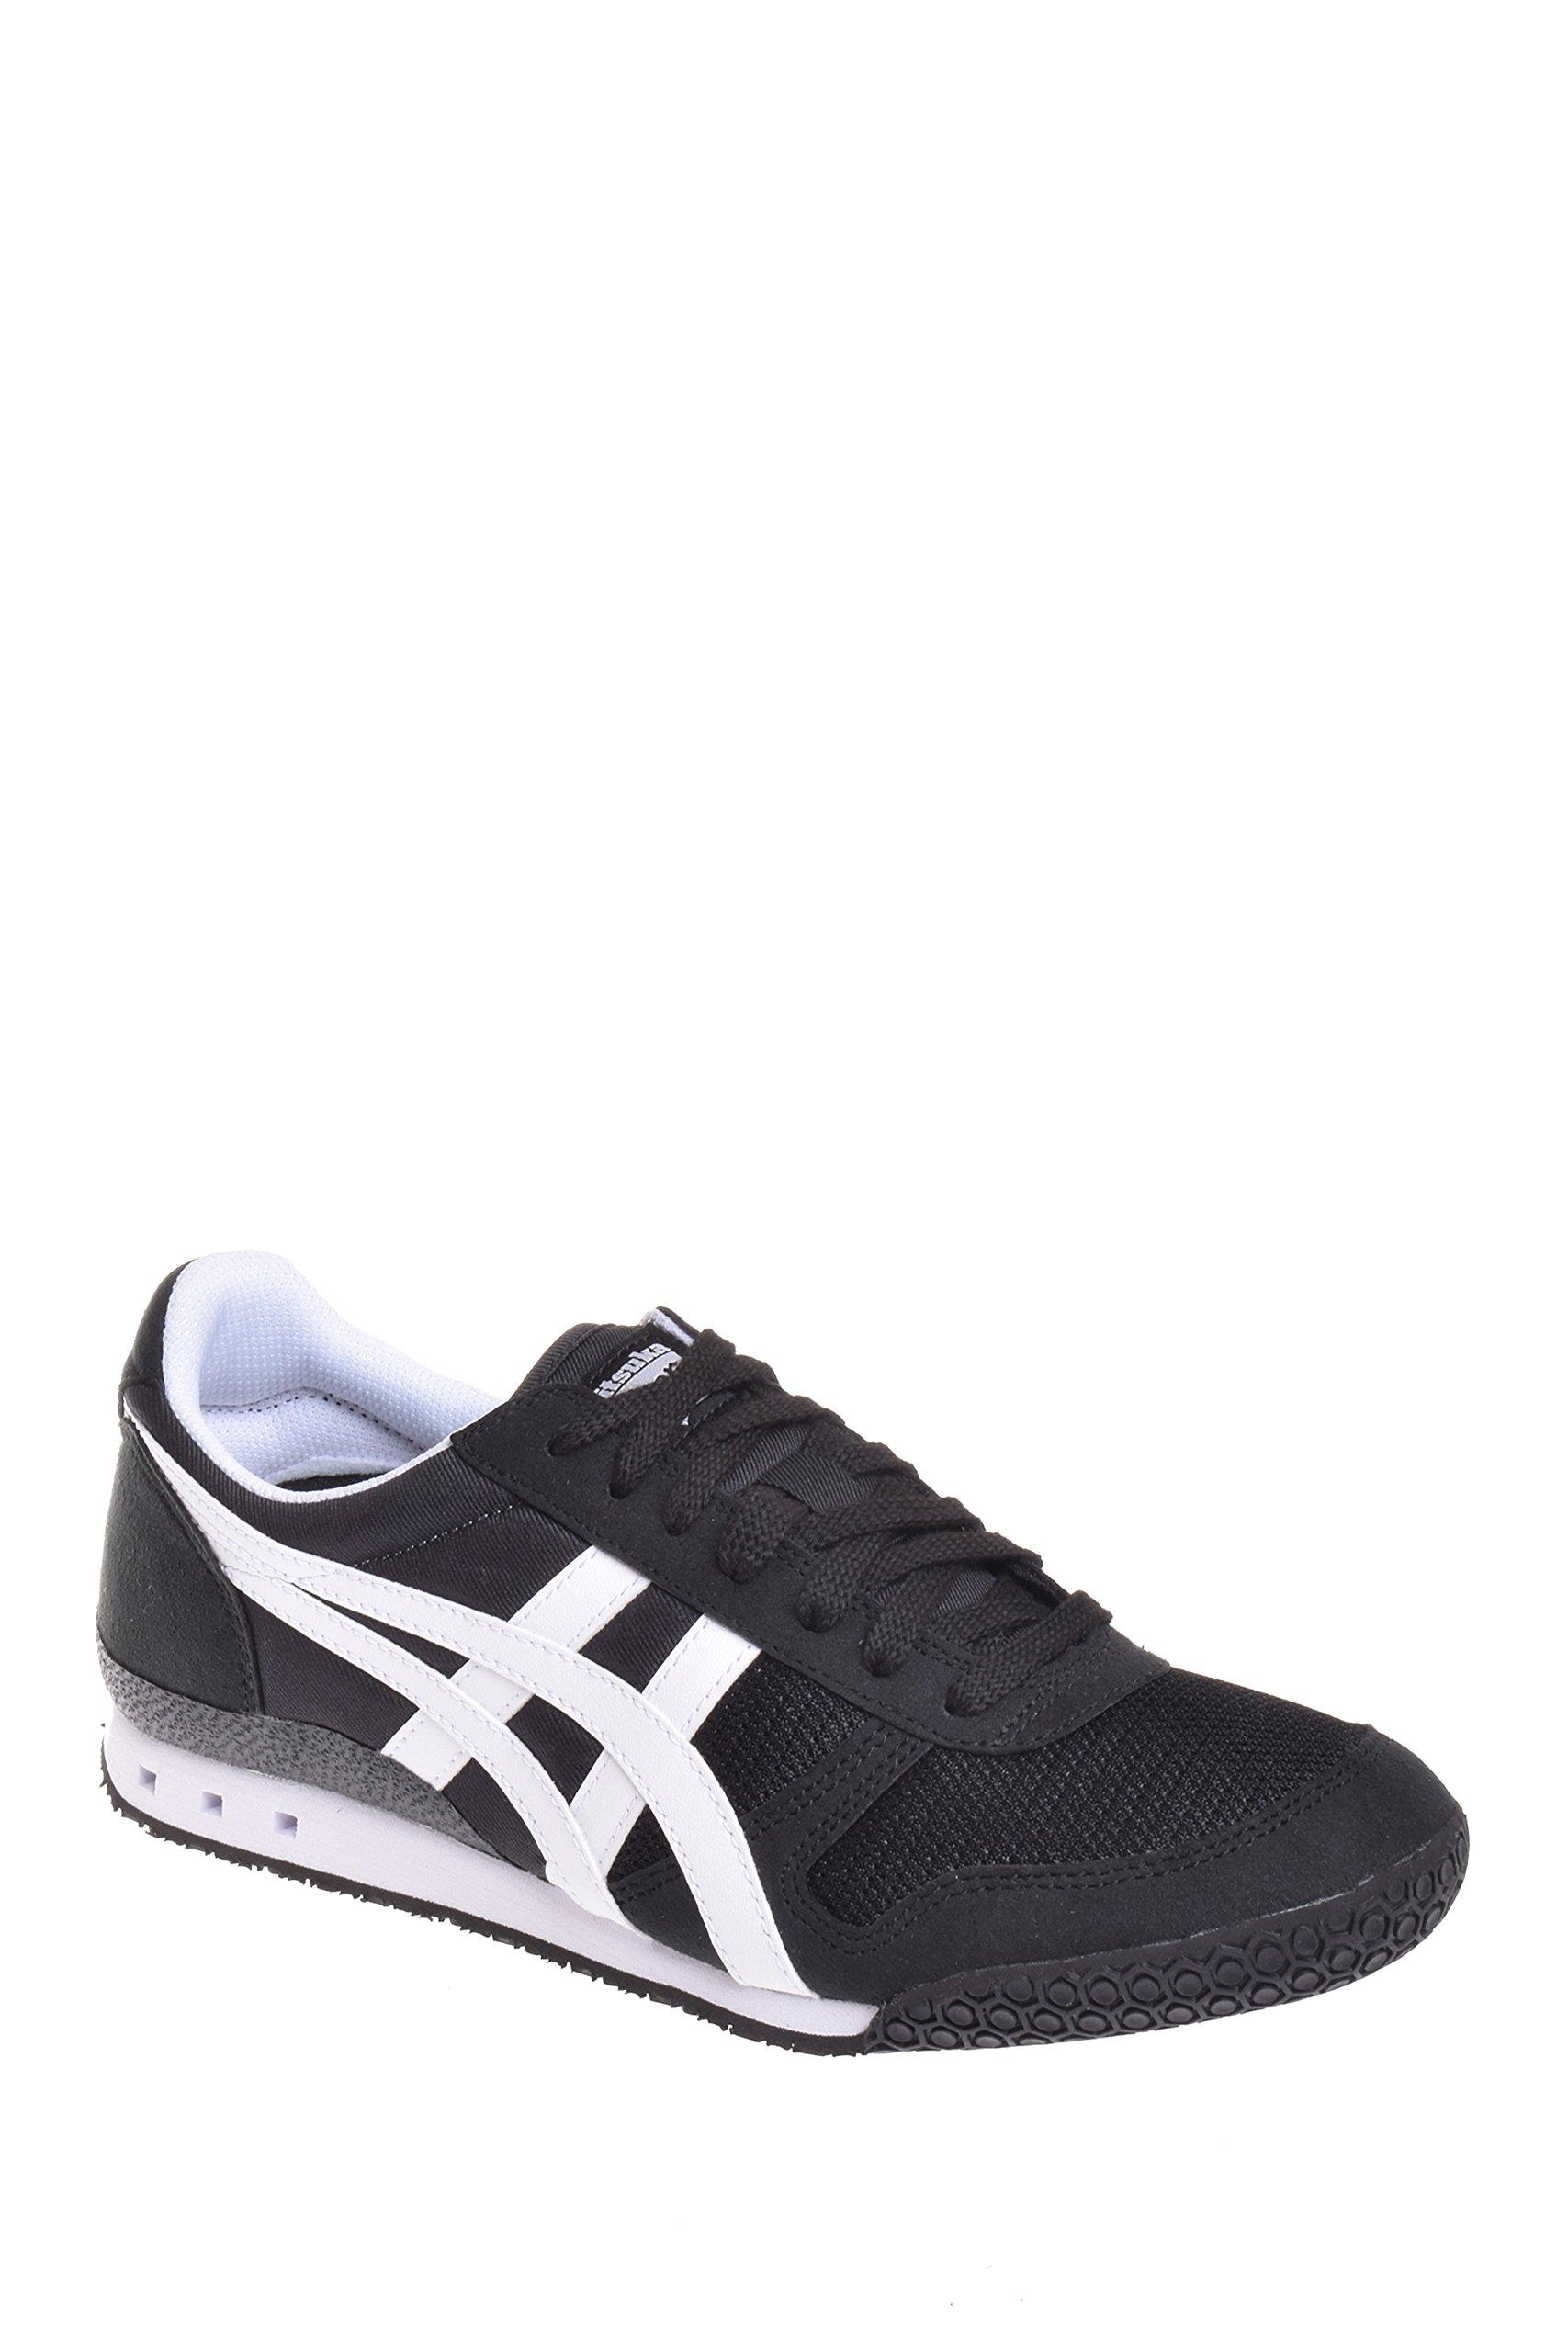 huge discount 2115d a57b6 ASICS Men's Onitsuka Tiger Ultimate 81 Sneakers, Black/White (US 9)